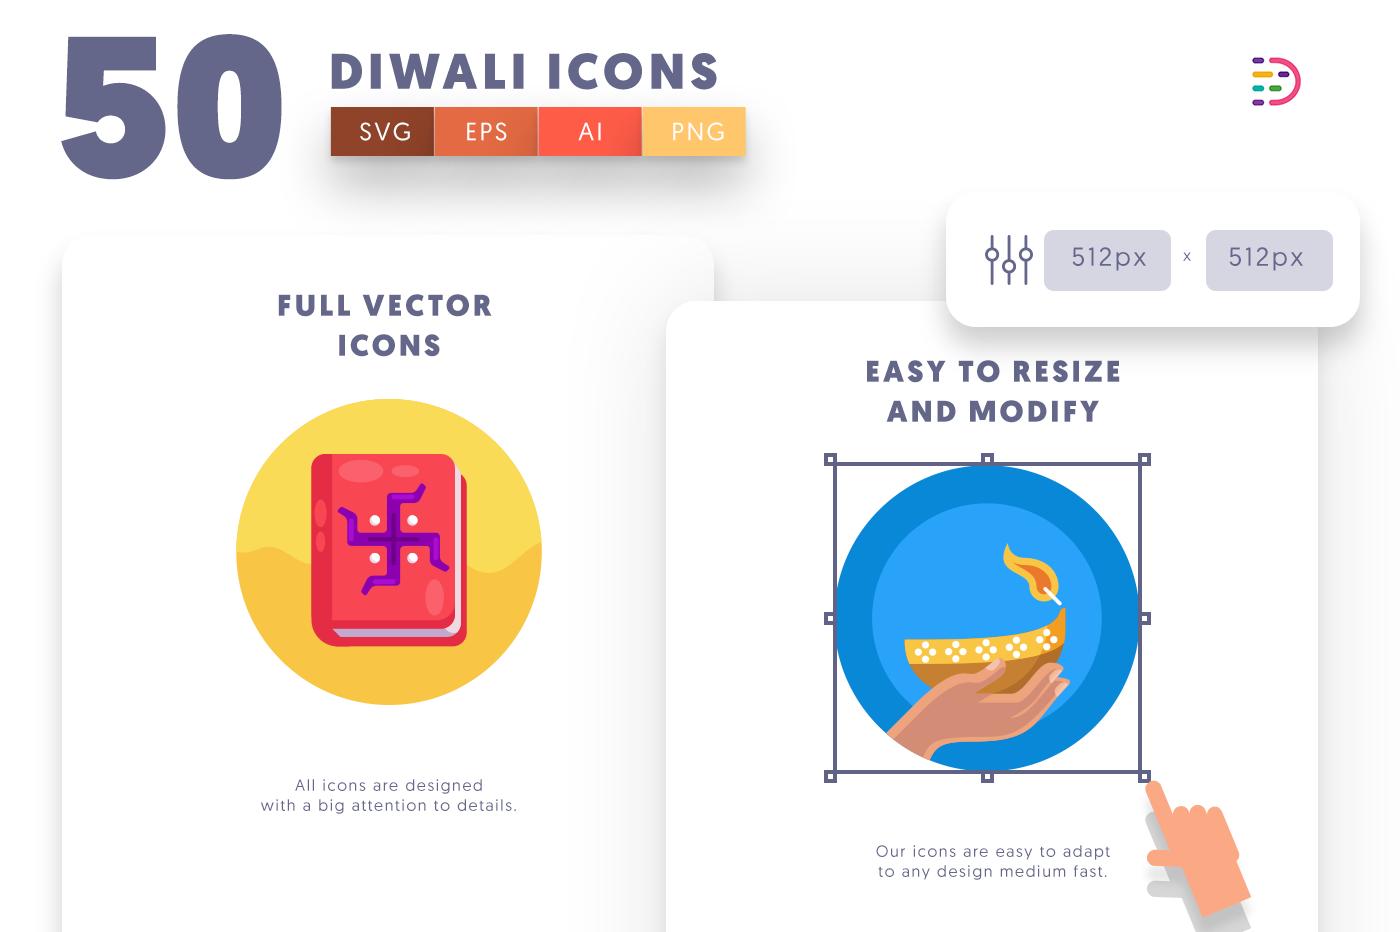 Full vector 50Diwali Icons